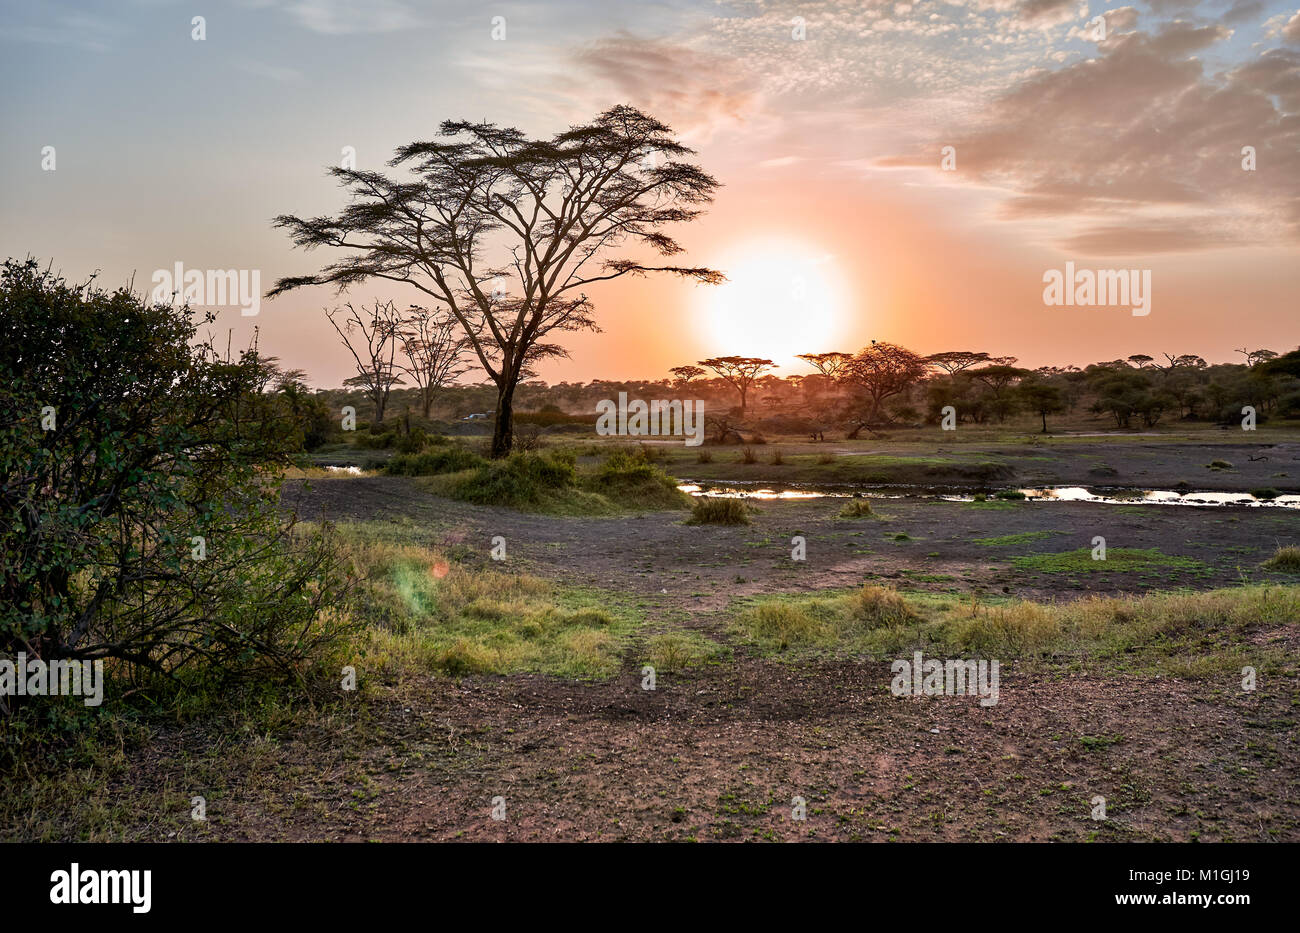 Sonnenaufgang in der Serengeti Nationalpark, UNESCO-Weltkulturerbe, Tansania, Afrika Stockfoto